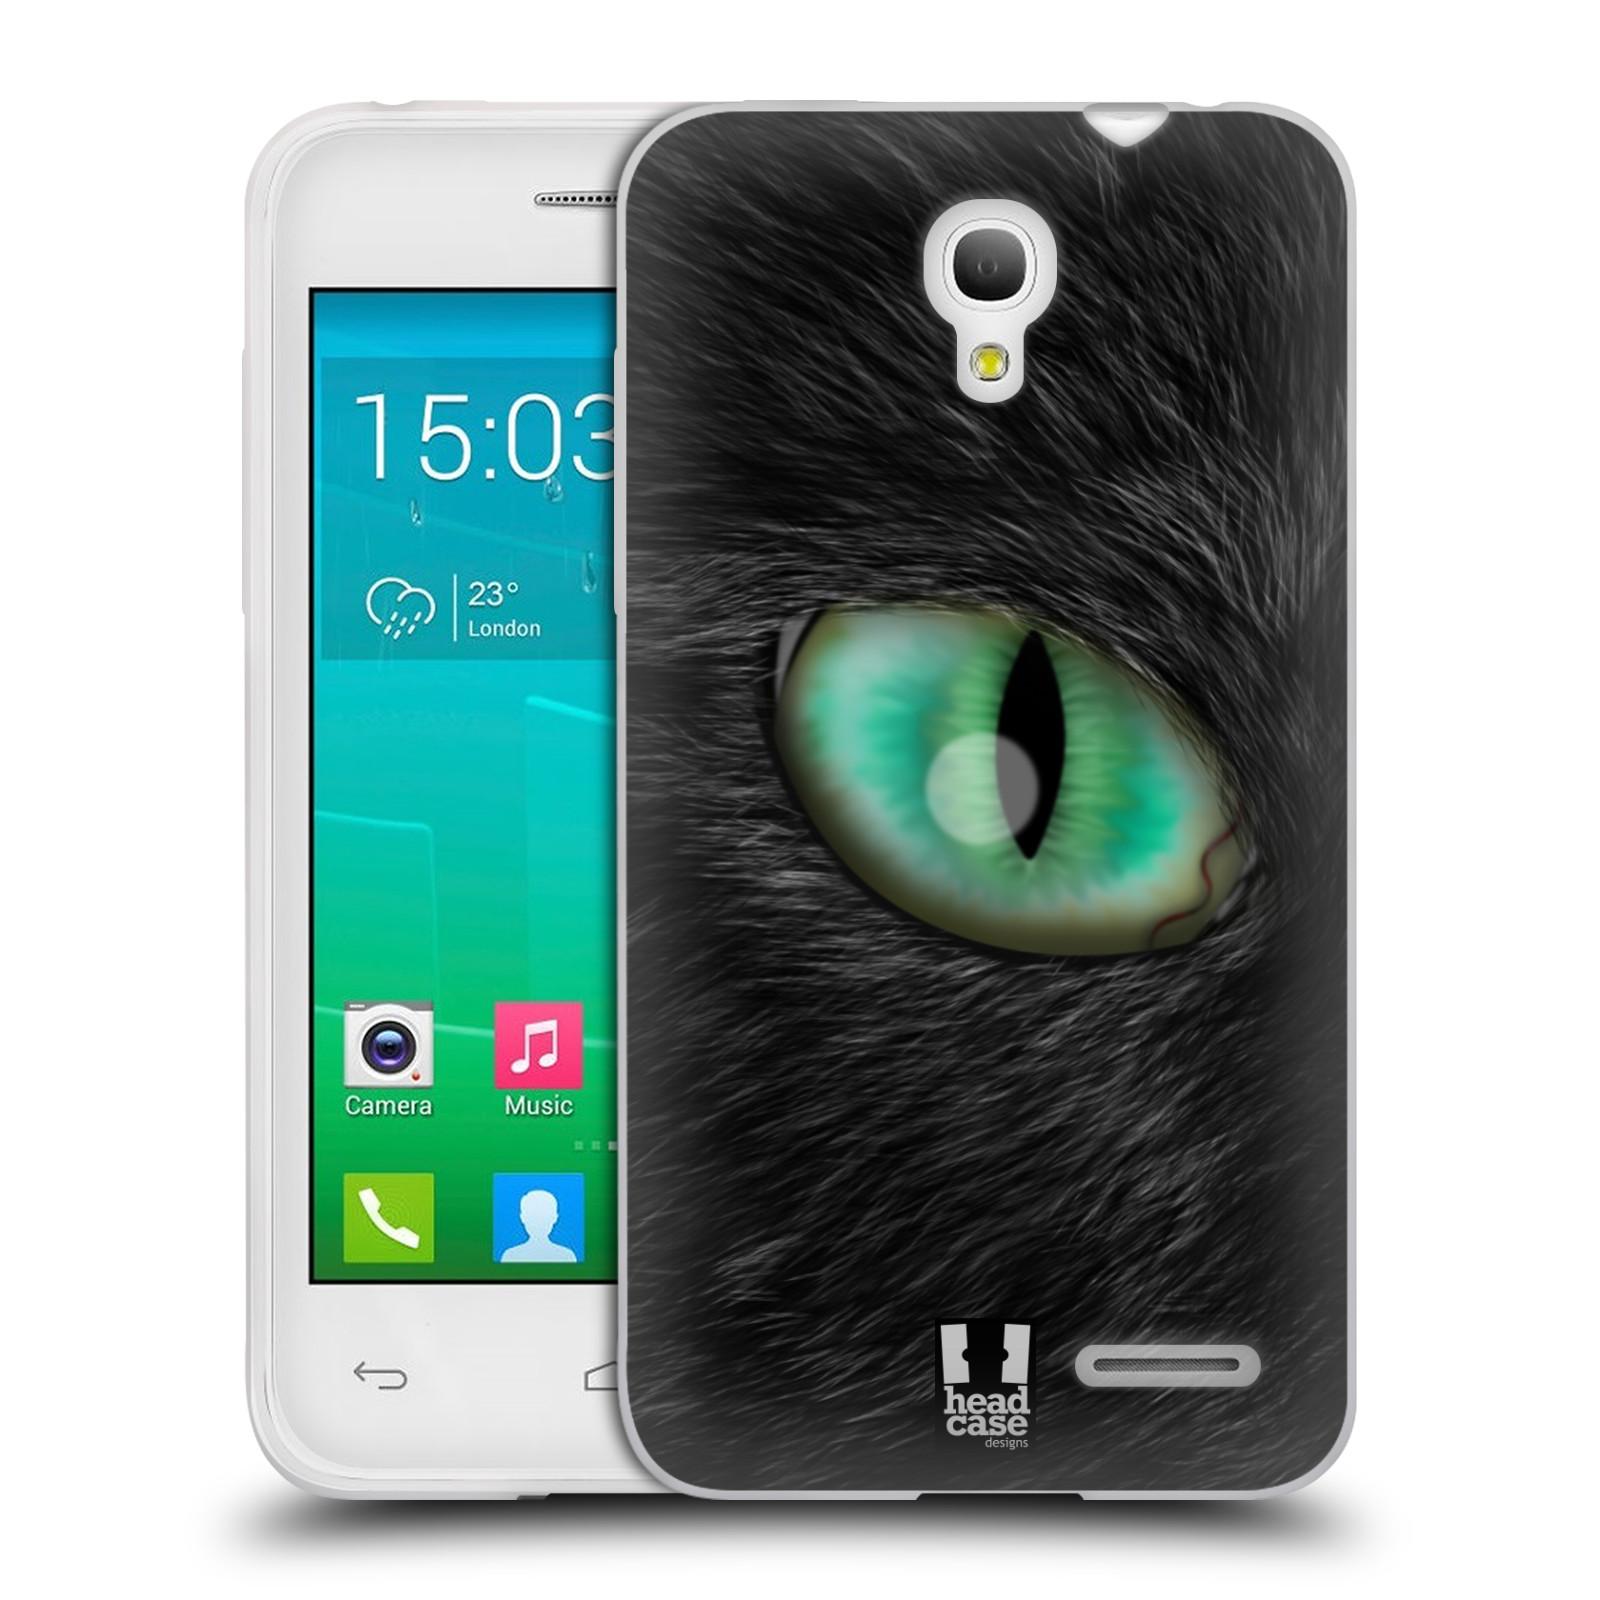 HEAD CASE silikonový obal na mobil Alcatel POP S3 OT-5050Y vzor pohled zvířete oko kočka